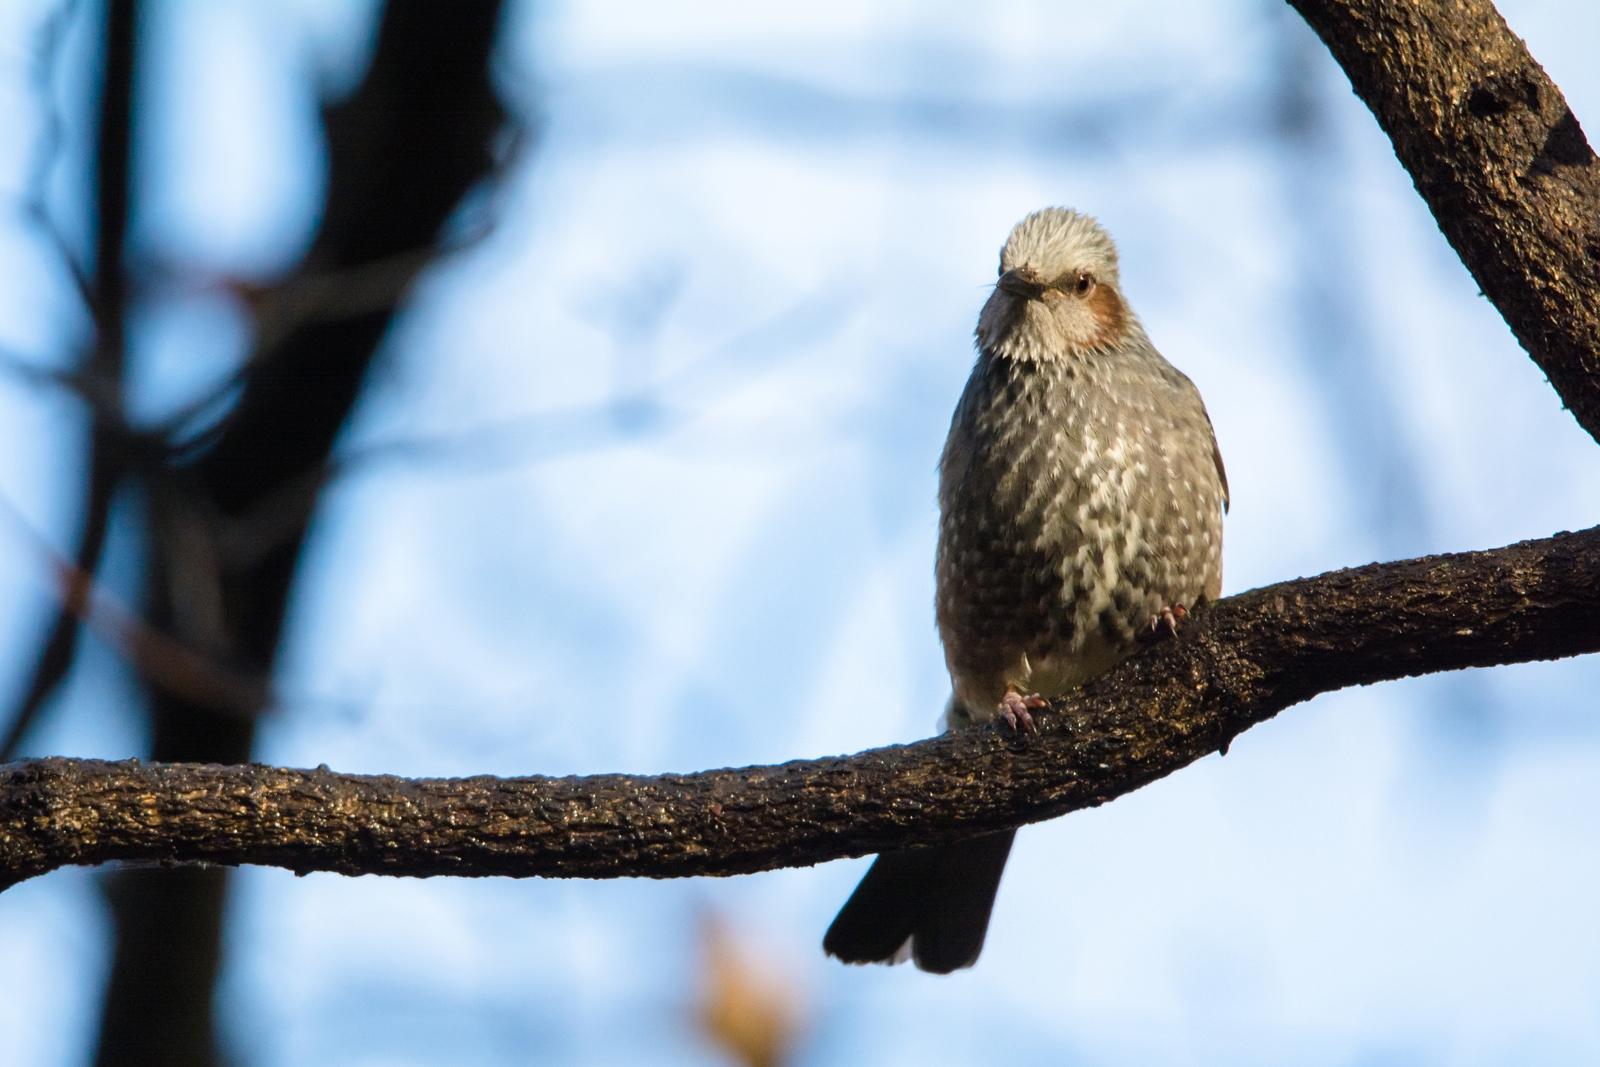 Photo: ぬくもりを待つ Wait for warmth.  じっと待つ 暖かな日が来るまで がまんがまん 春はまだかな  Brown-eared Bulbul. (ヒヨドリ) #cooljapan #365cooljapanmay #birdphotography #birds #kawaii #sigma  Nikon D7100 SIGMA 150-600mm F5-6.3 DG OS HSM Sports [ Day238, January 5th ] (3枚追加:Added 3 photo)